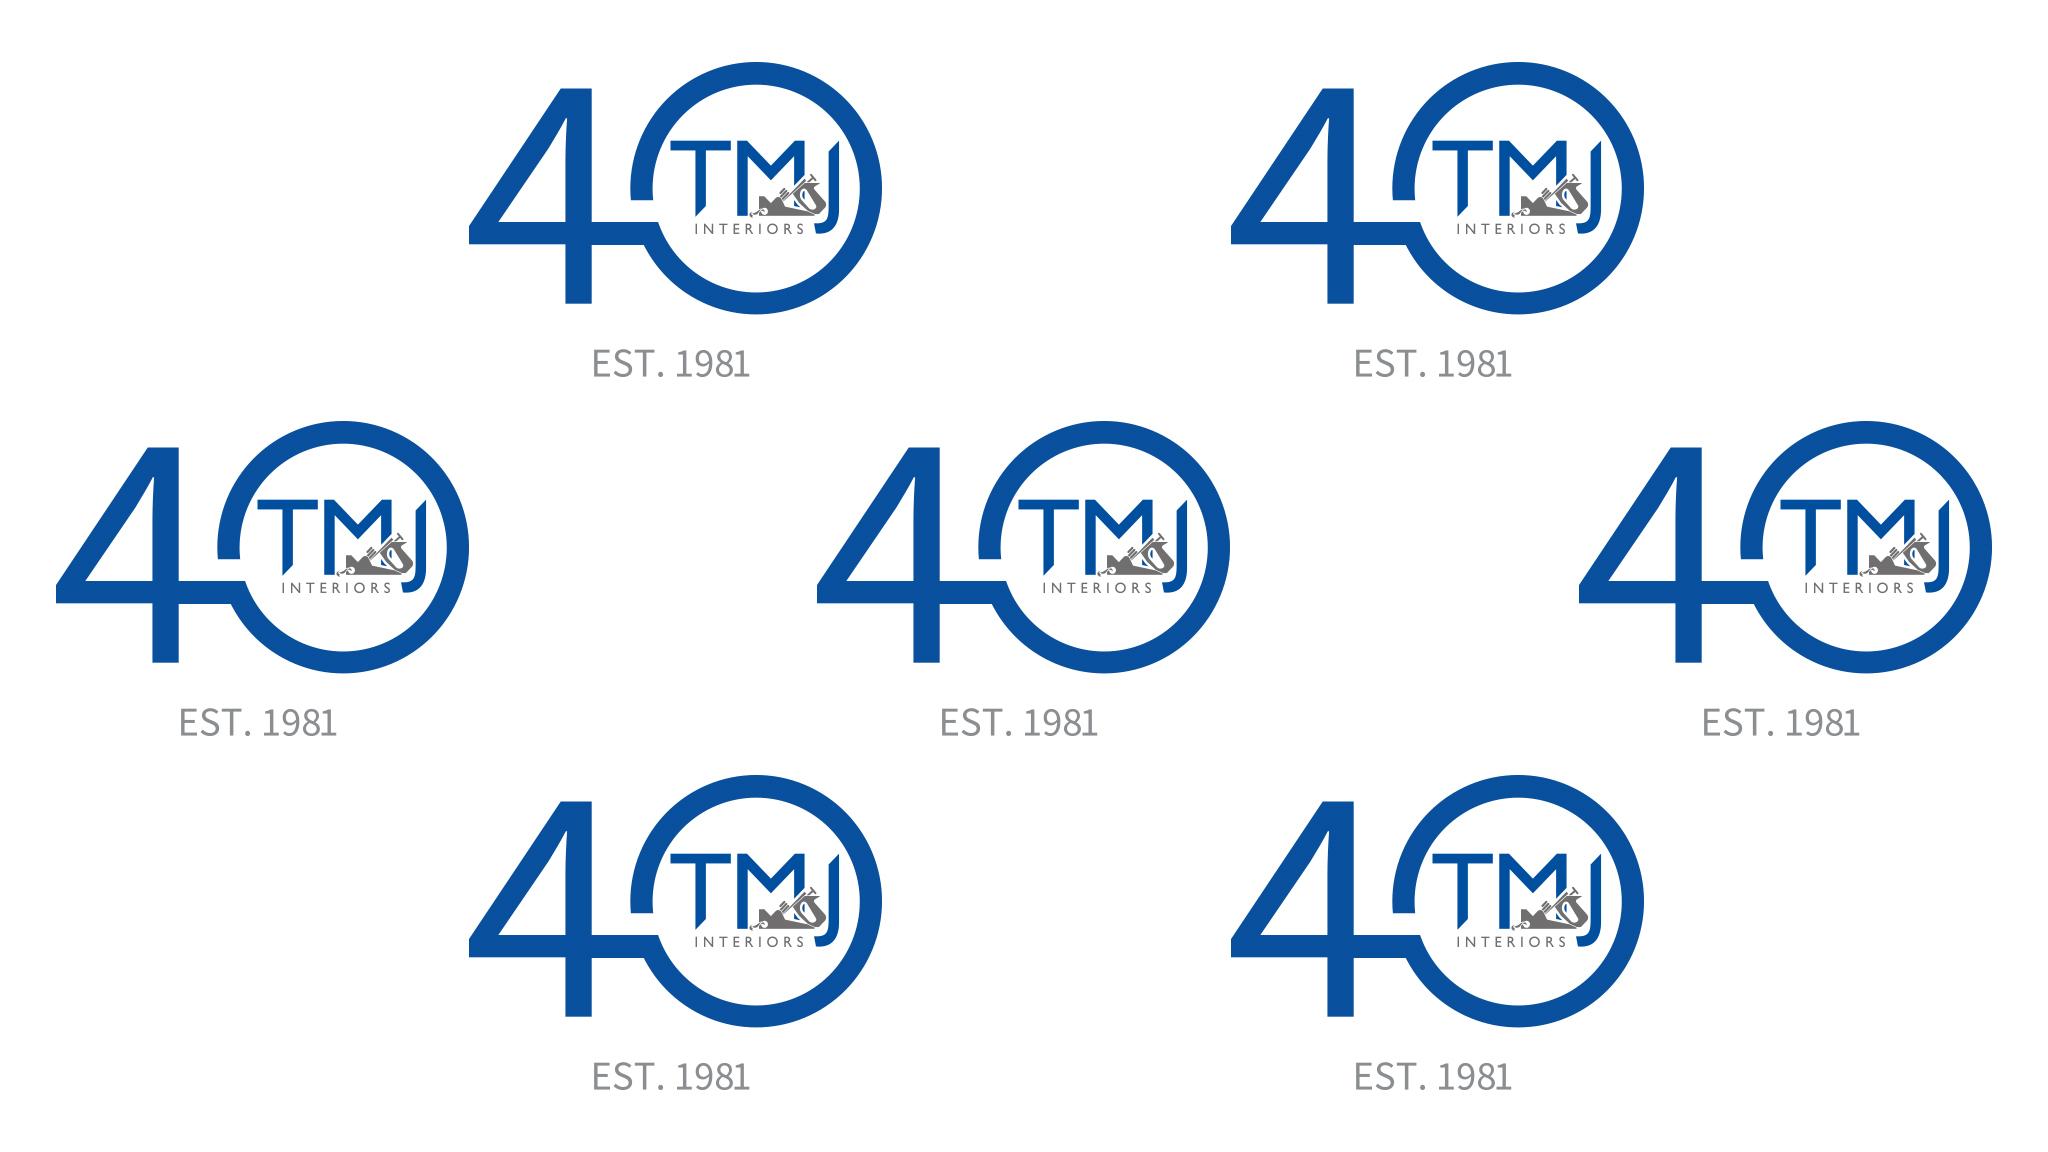 40 years Teams Background